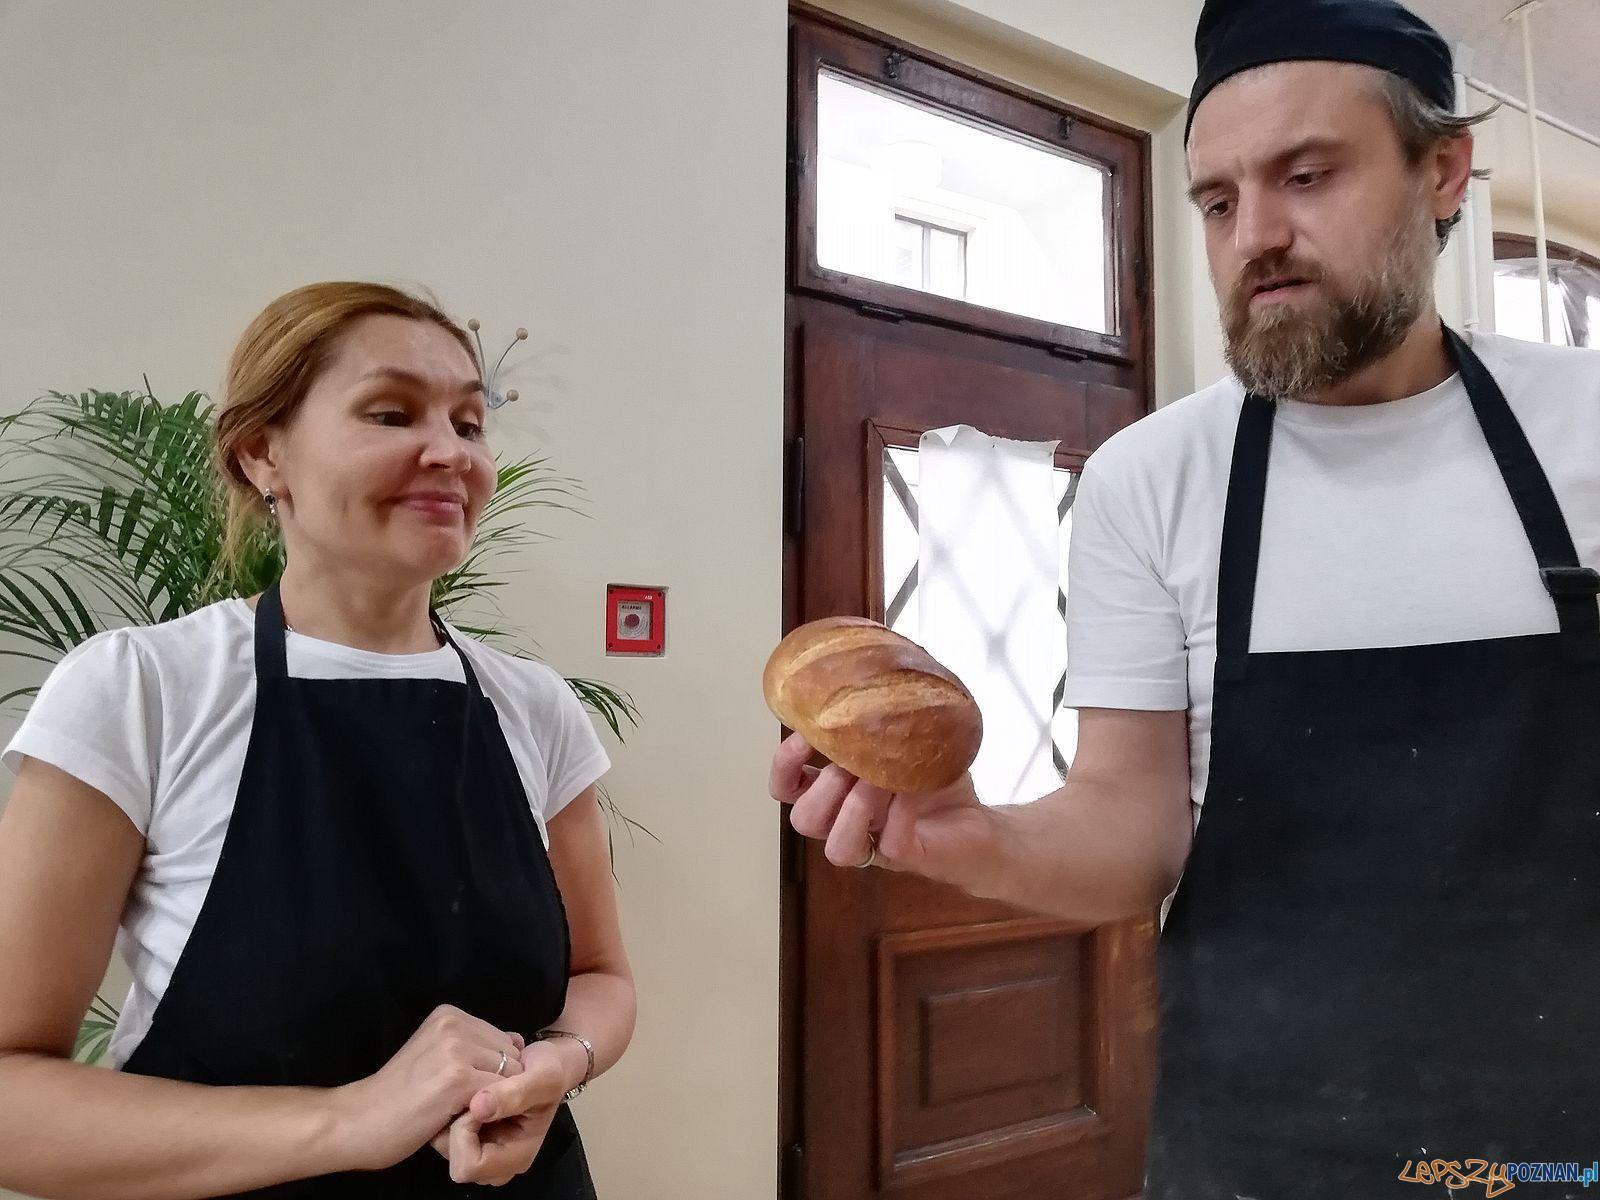 Małżeństwo Boltenkov - Le petite patisserie - Klasztorna / Wielka  Foto: Tomasz Dworek